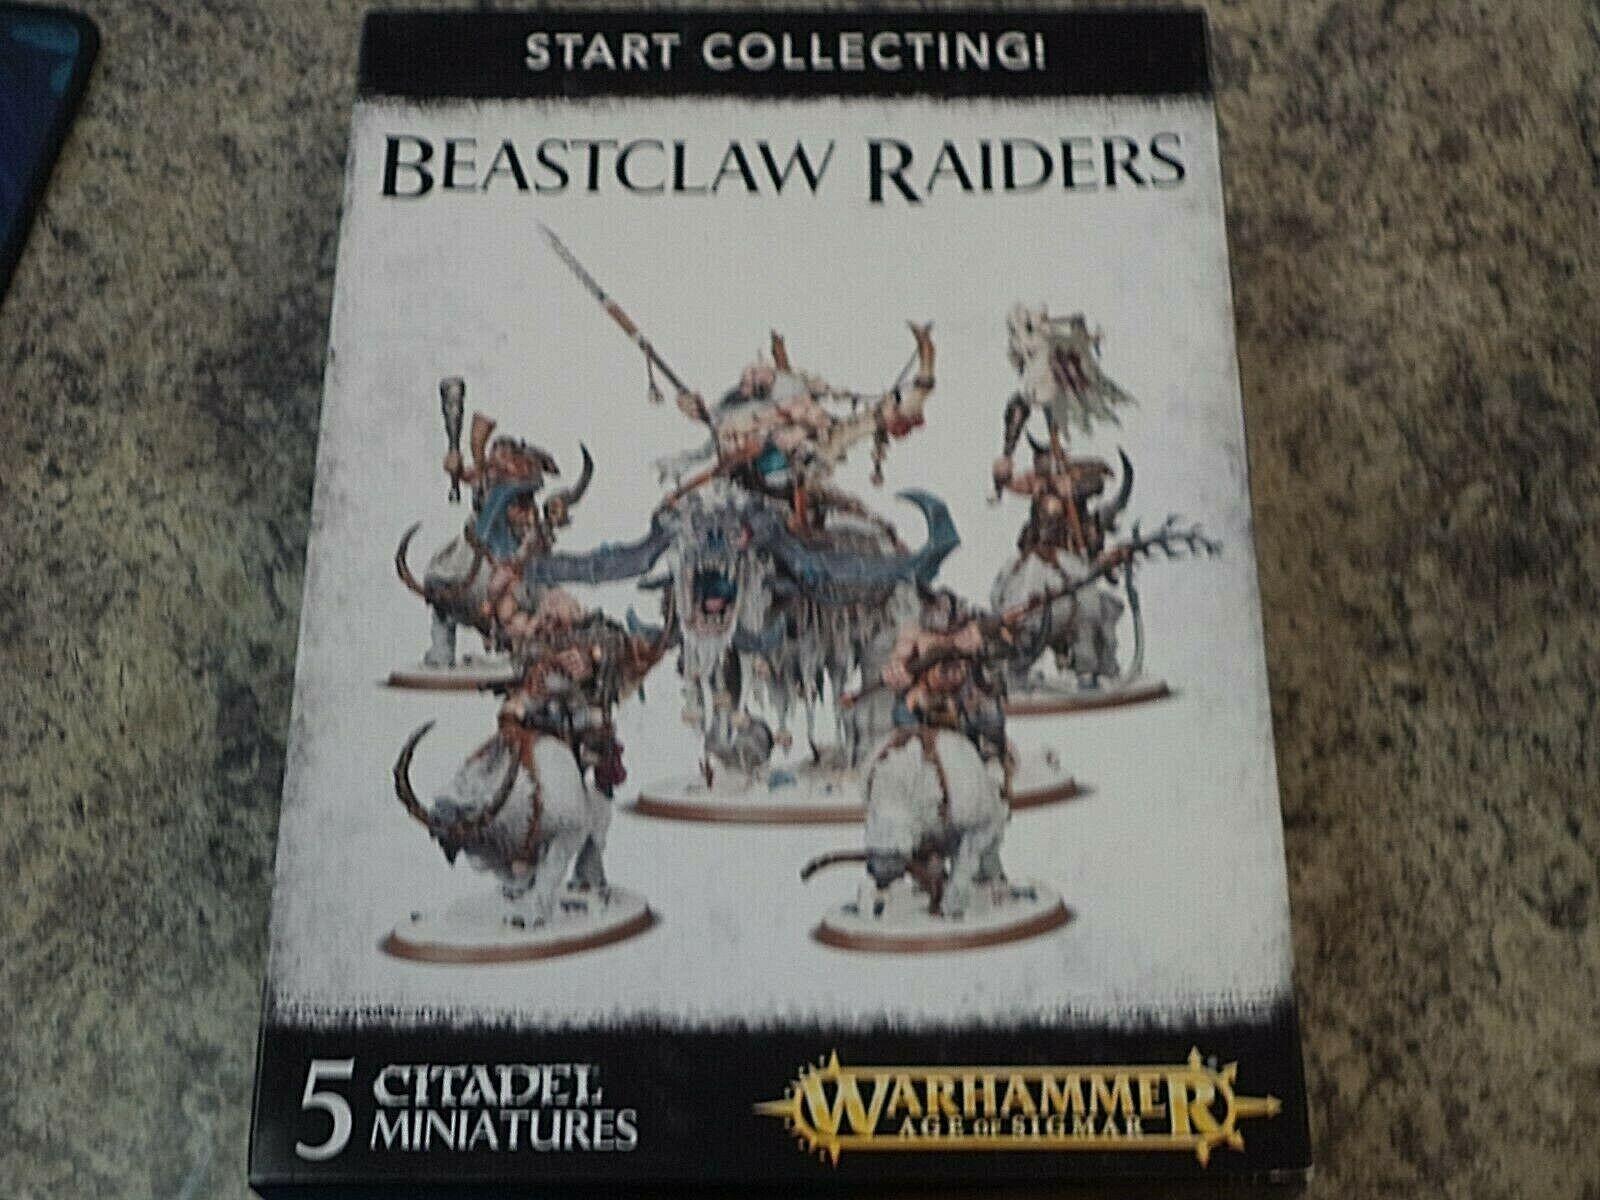 Estrellat Collecting Beastclaw Raiders Warhammer Age of  Sigmar fantasycc modellololos nuovo   presa di fabbrica